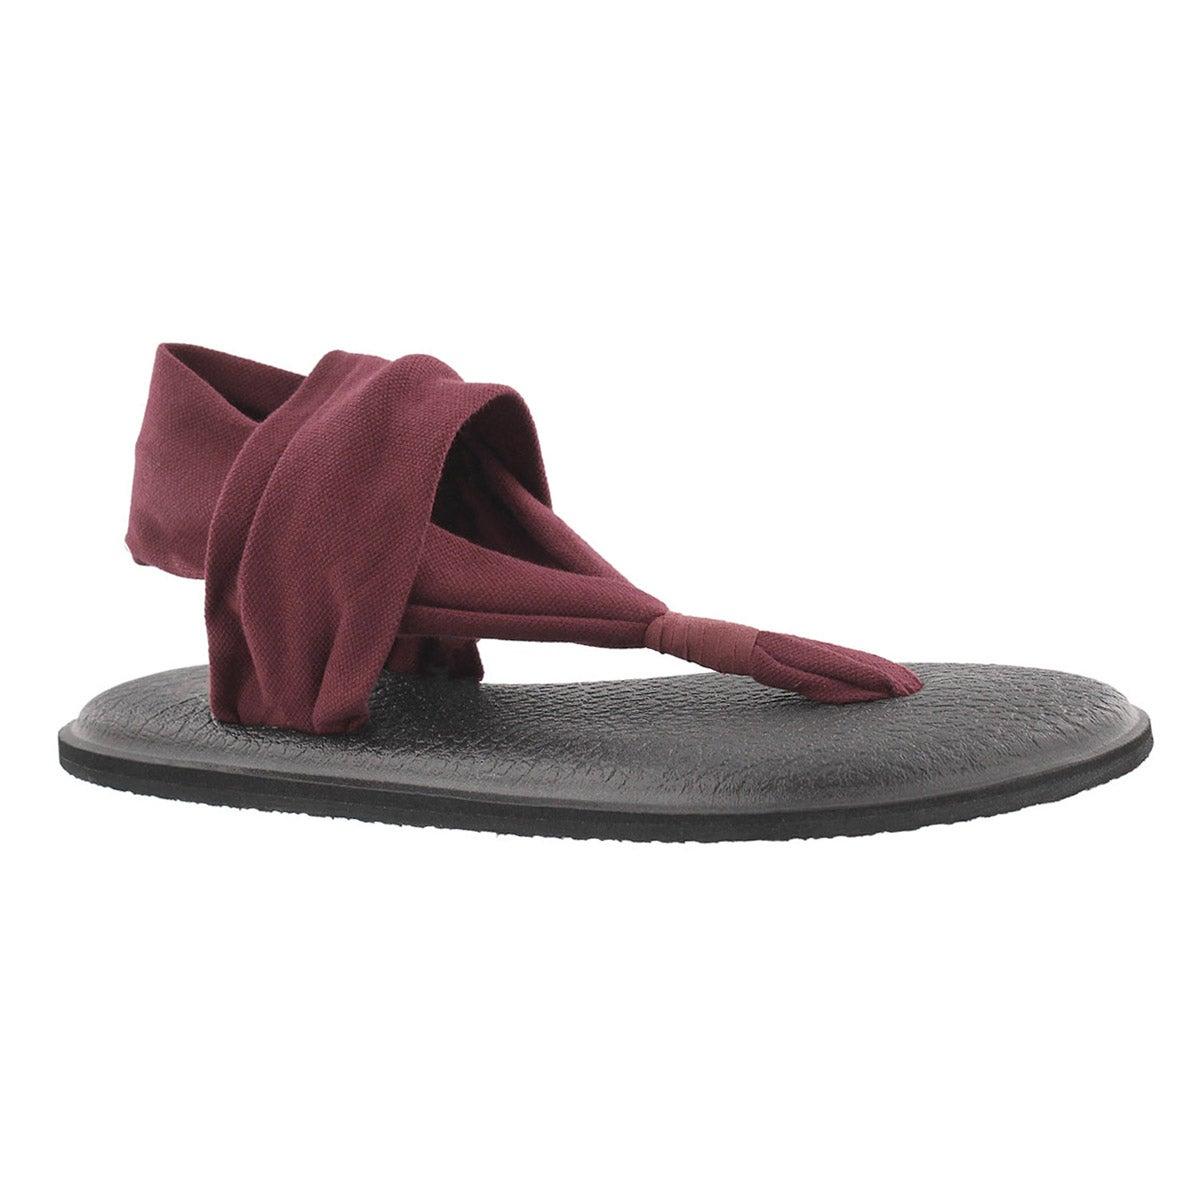 Women's YOGA SLING burgundy thong sandals